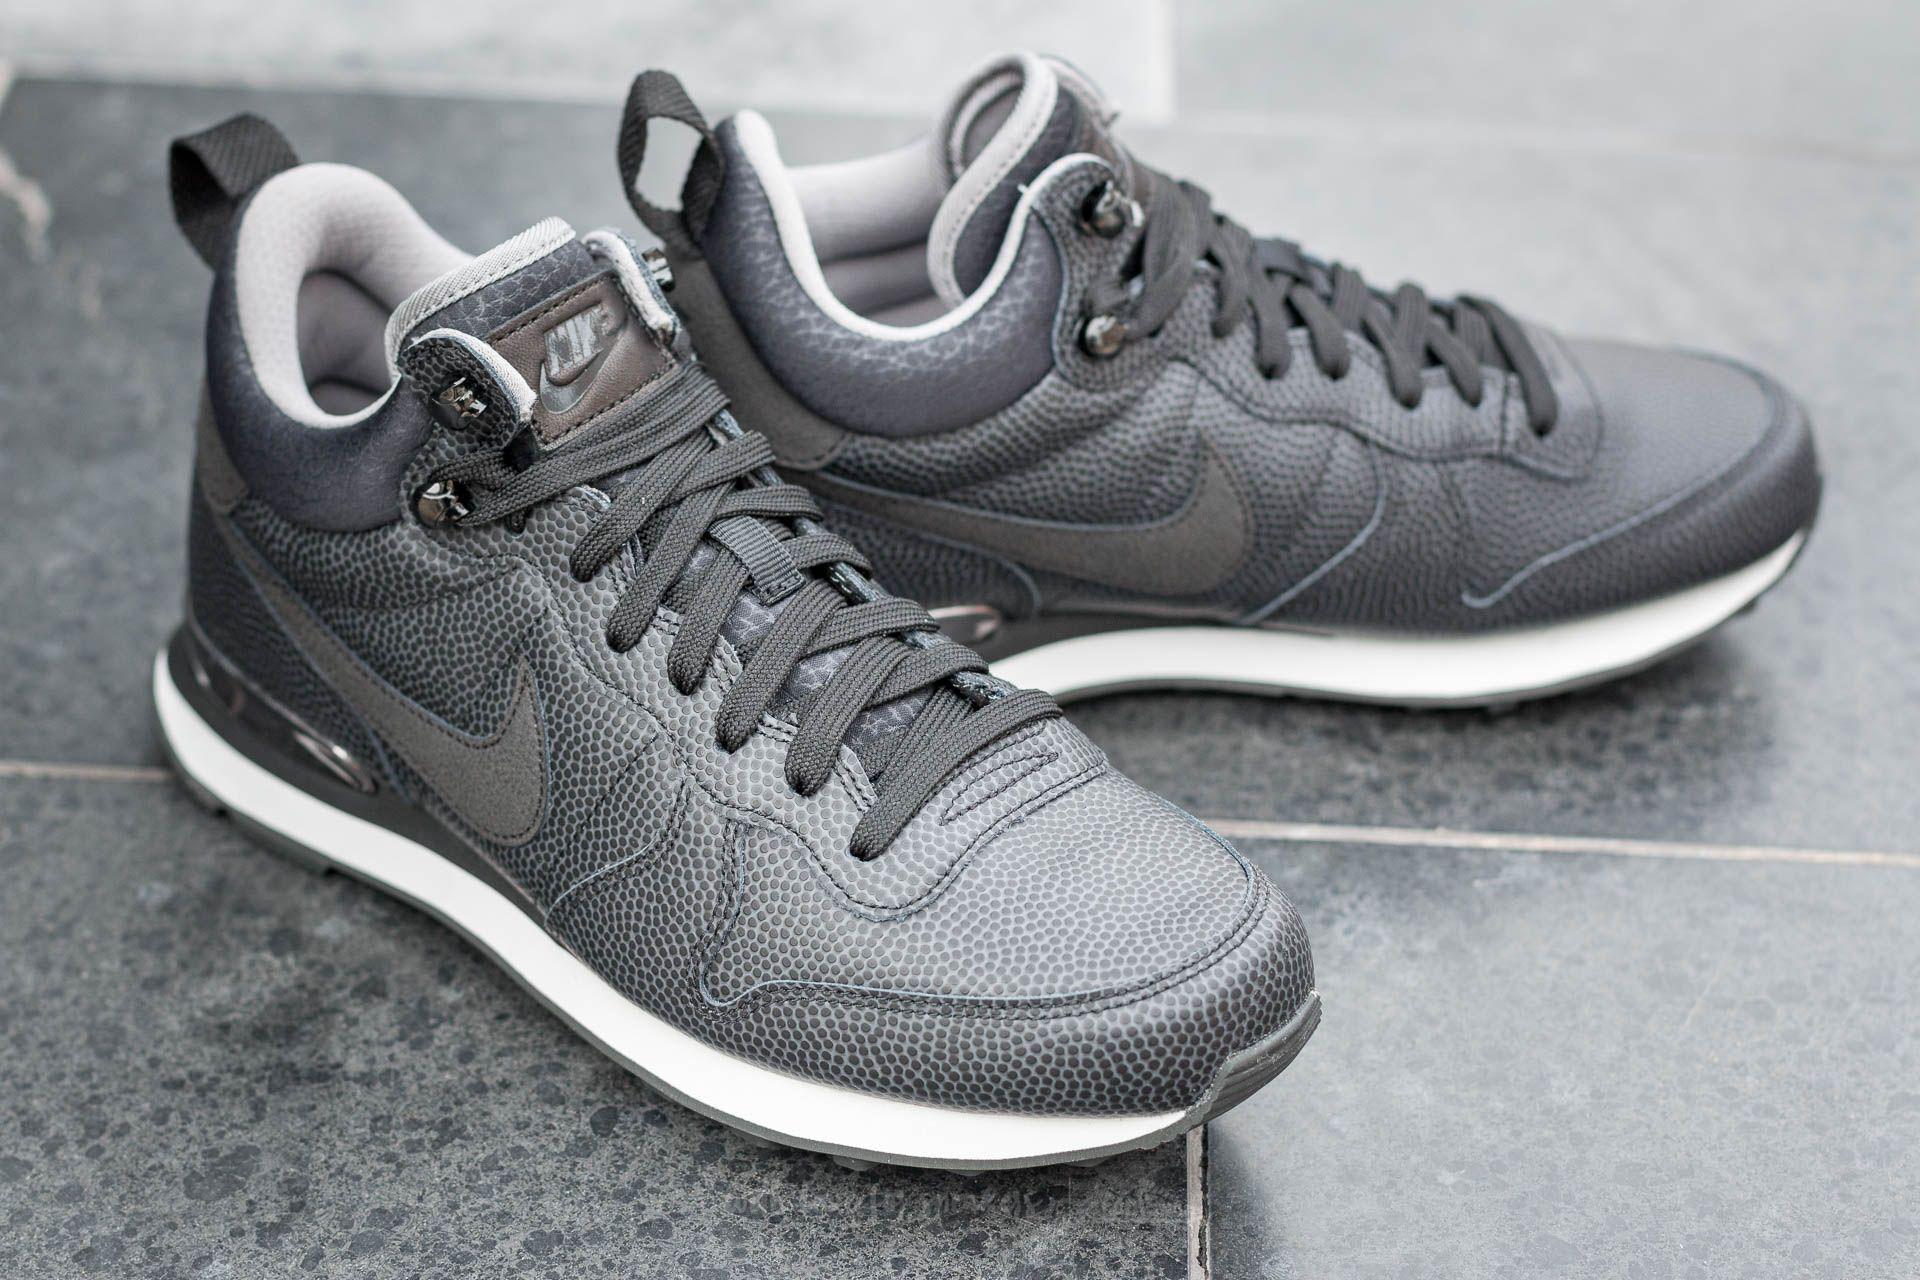 85724627cbf7 Lyst - Nike W Internationalist Mid Leather Black  Black-deep Pewter ...